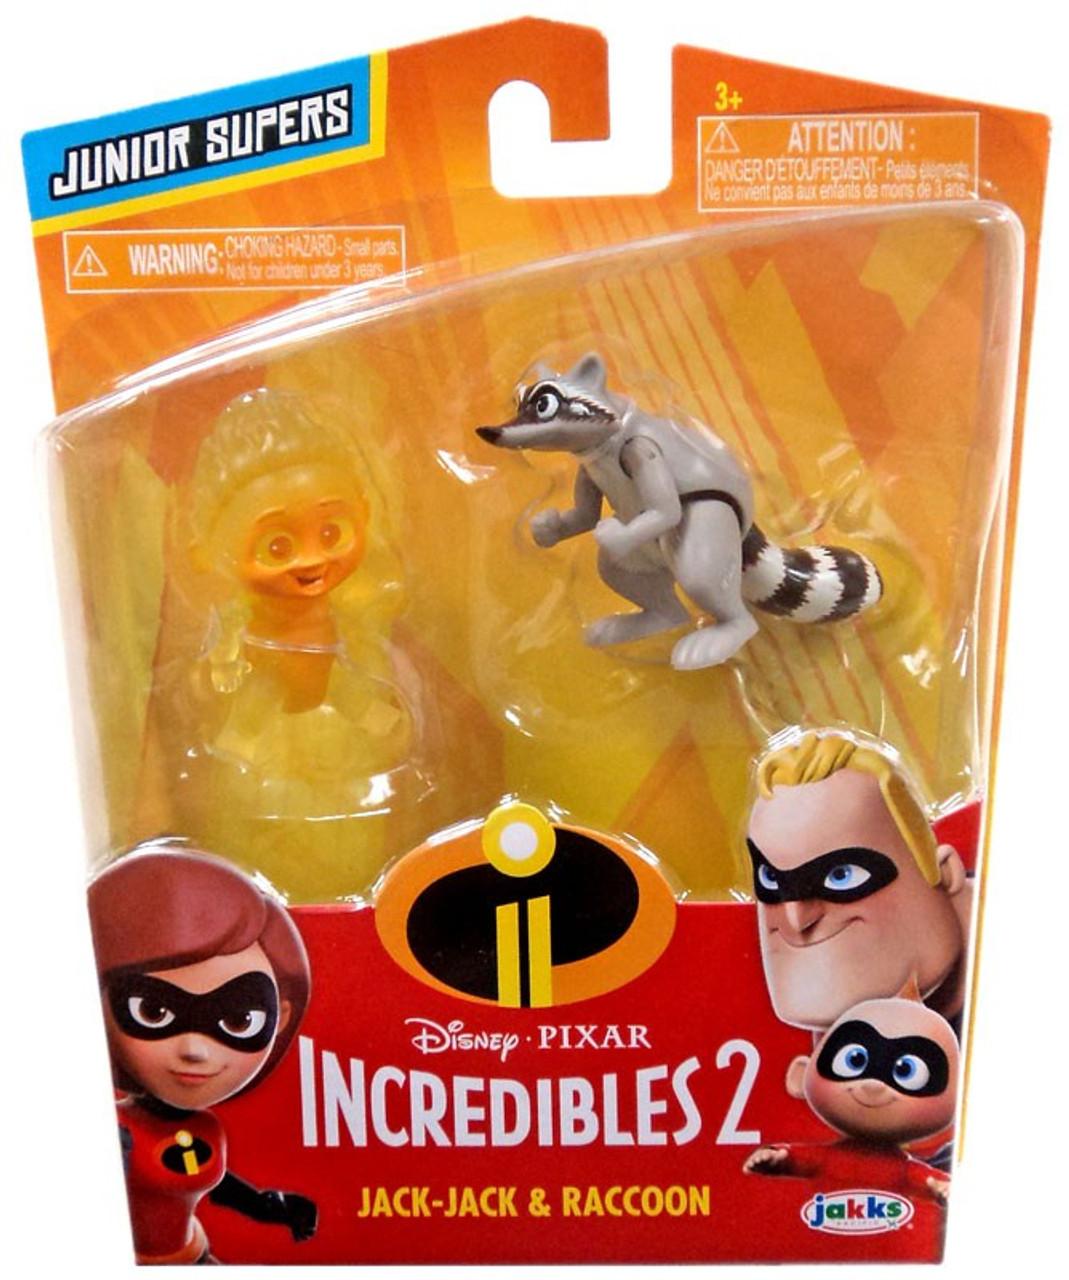 35acbb605e9 Disney Pixar Incredibles 2 Junior Supers Jack-Jack Raccoon 3 Mini Figure  2-Pack Jakks Pacific - ToyWiz